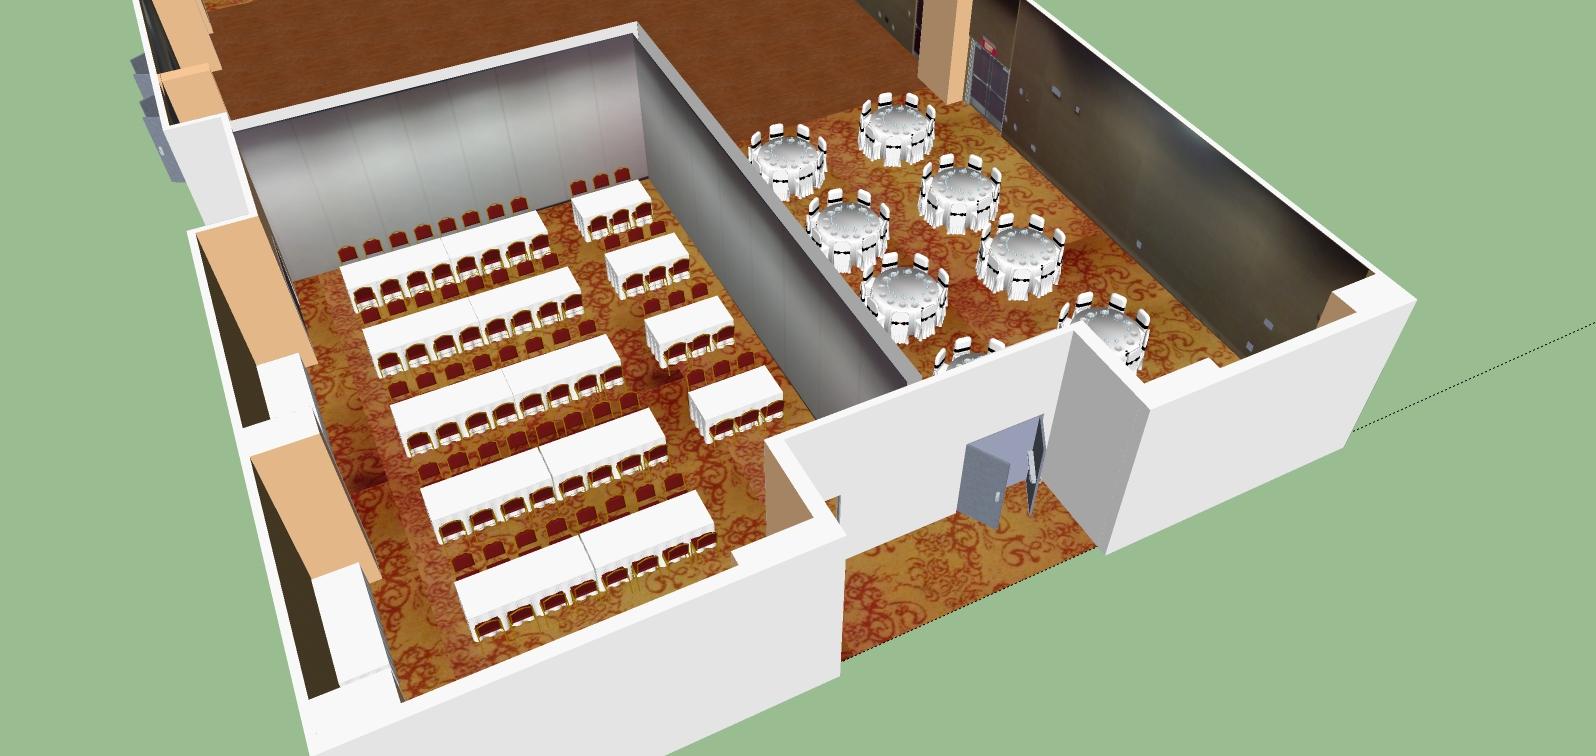 Parke Sierra Ballroom buffet seated dinner 104 people.jpg